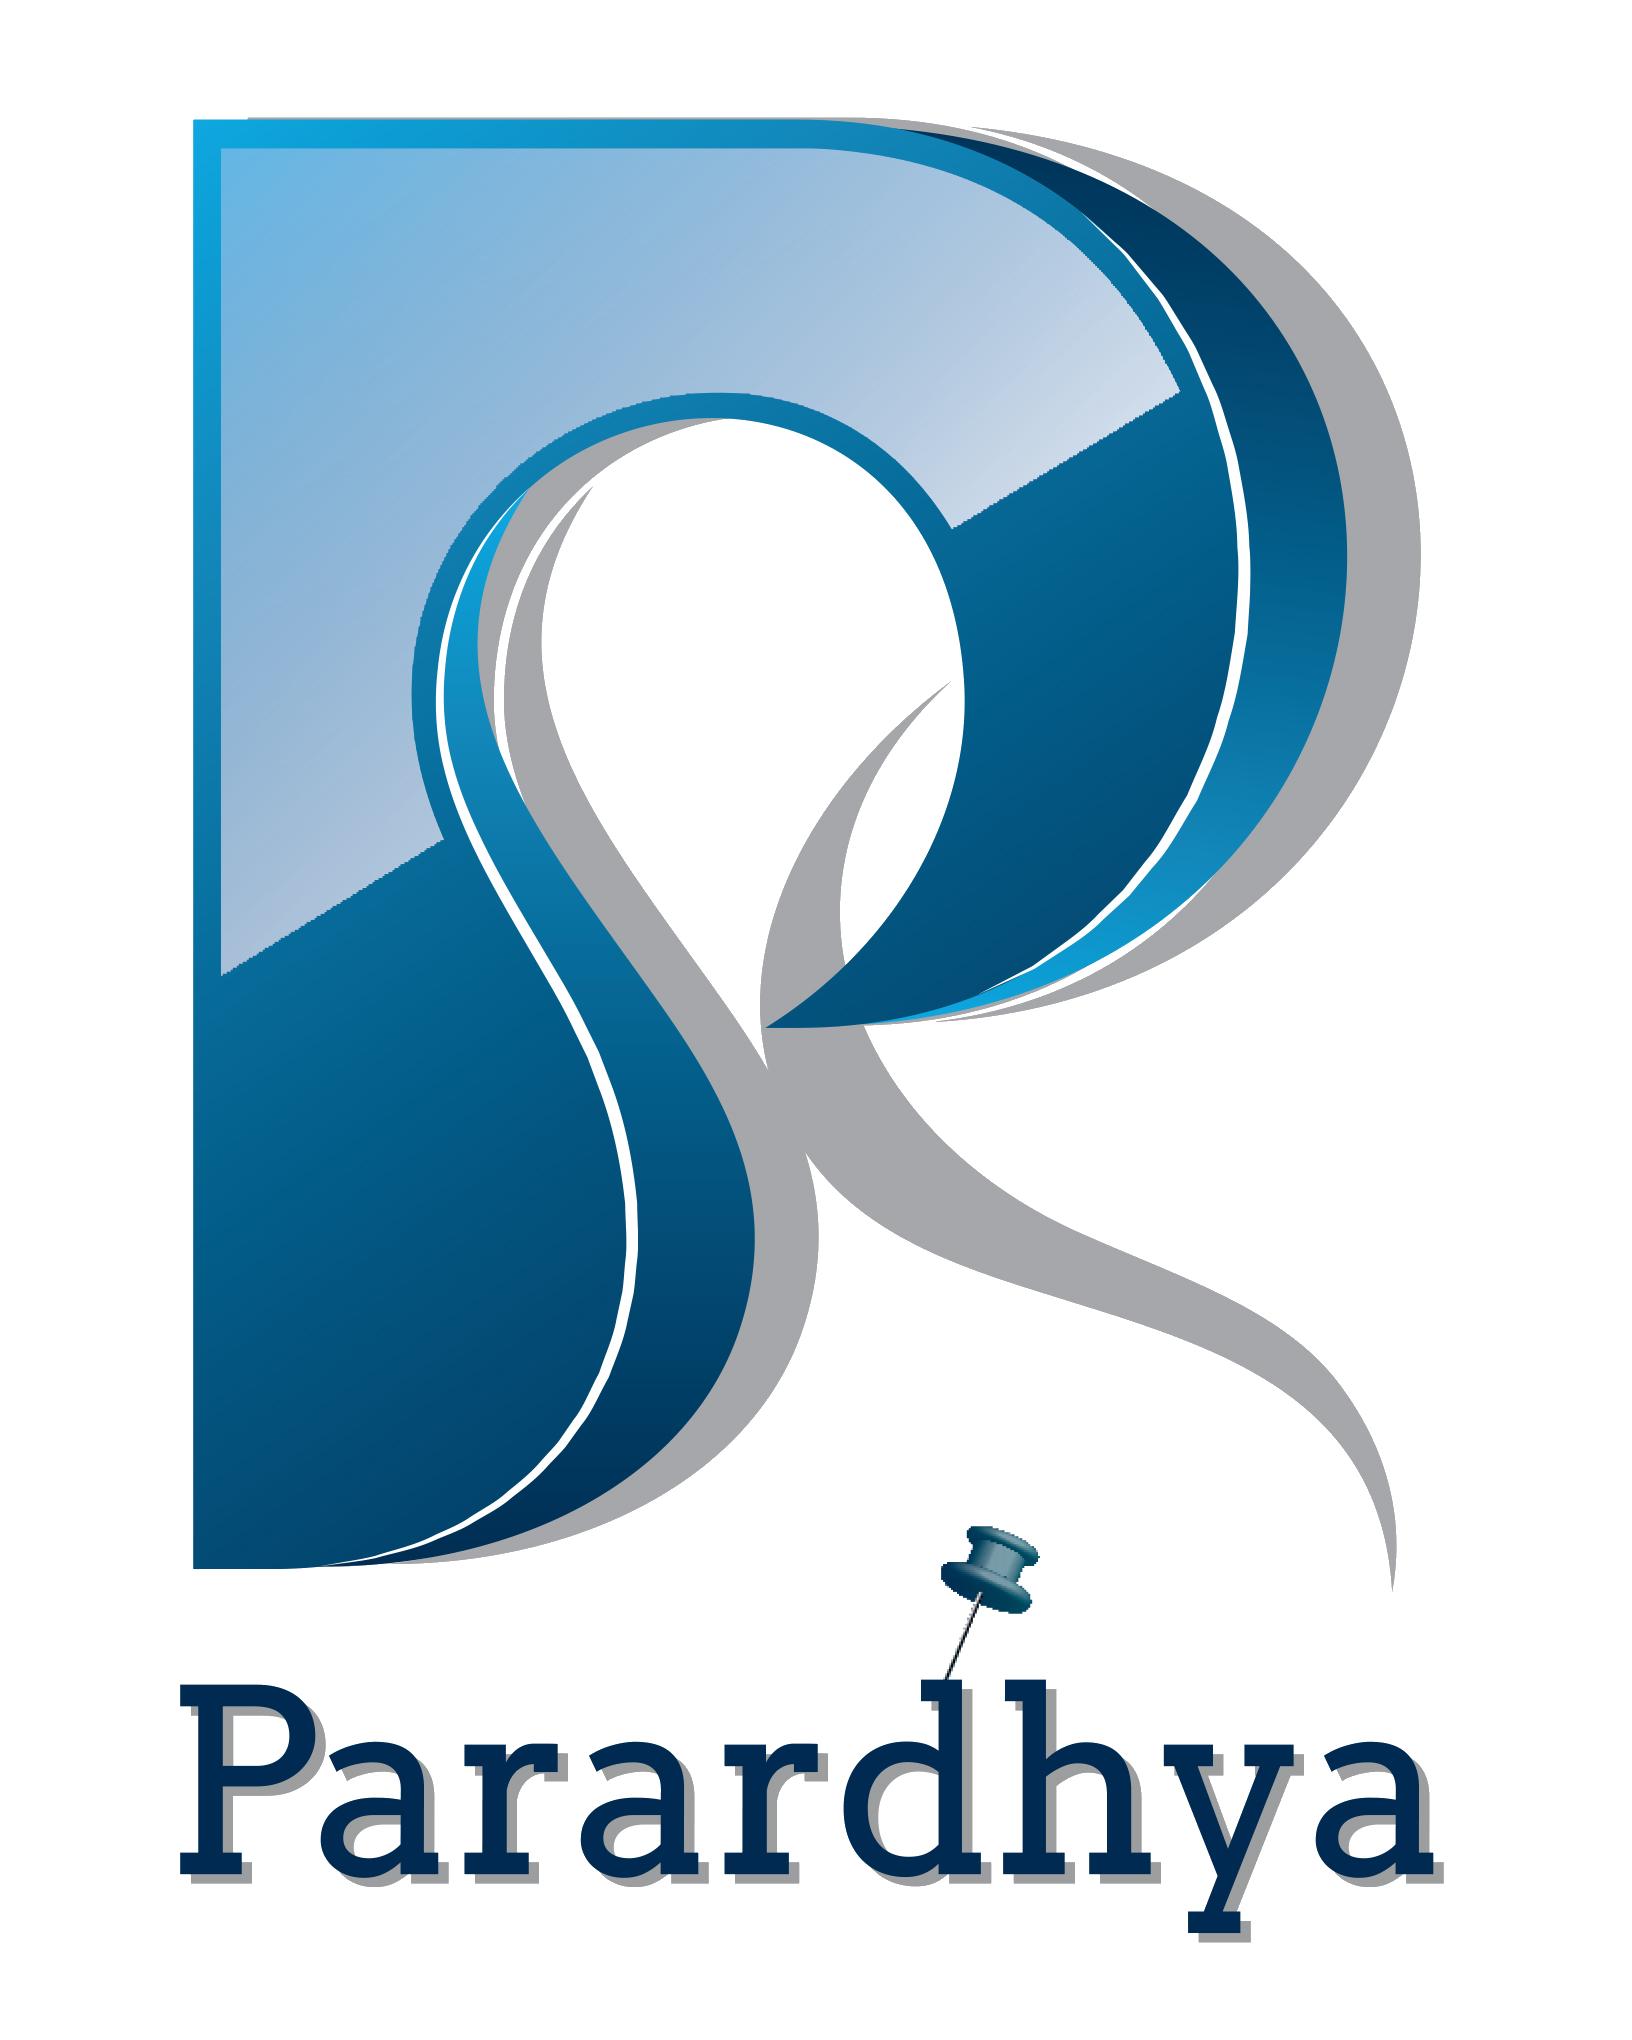 Engineering clipart automobile engineer. Parardhya automobiles restaurants engineers